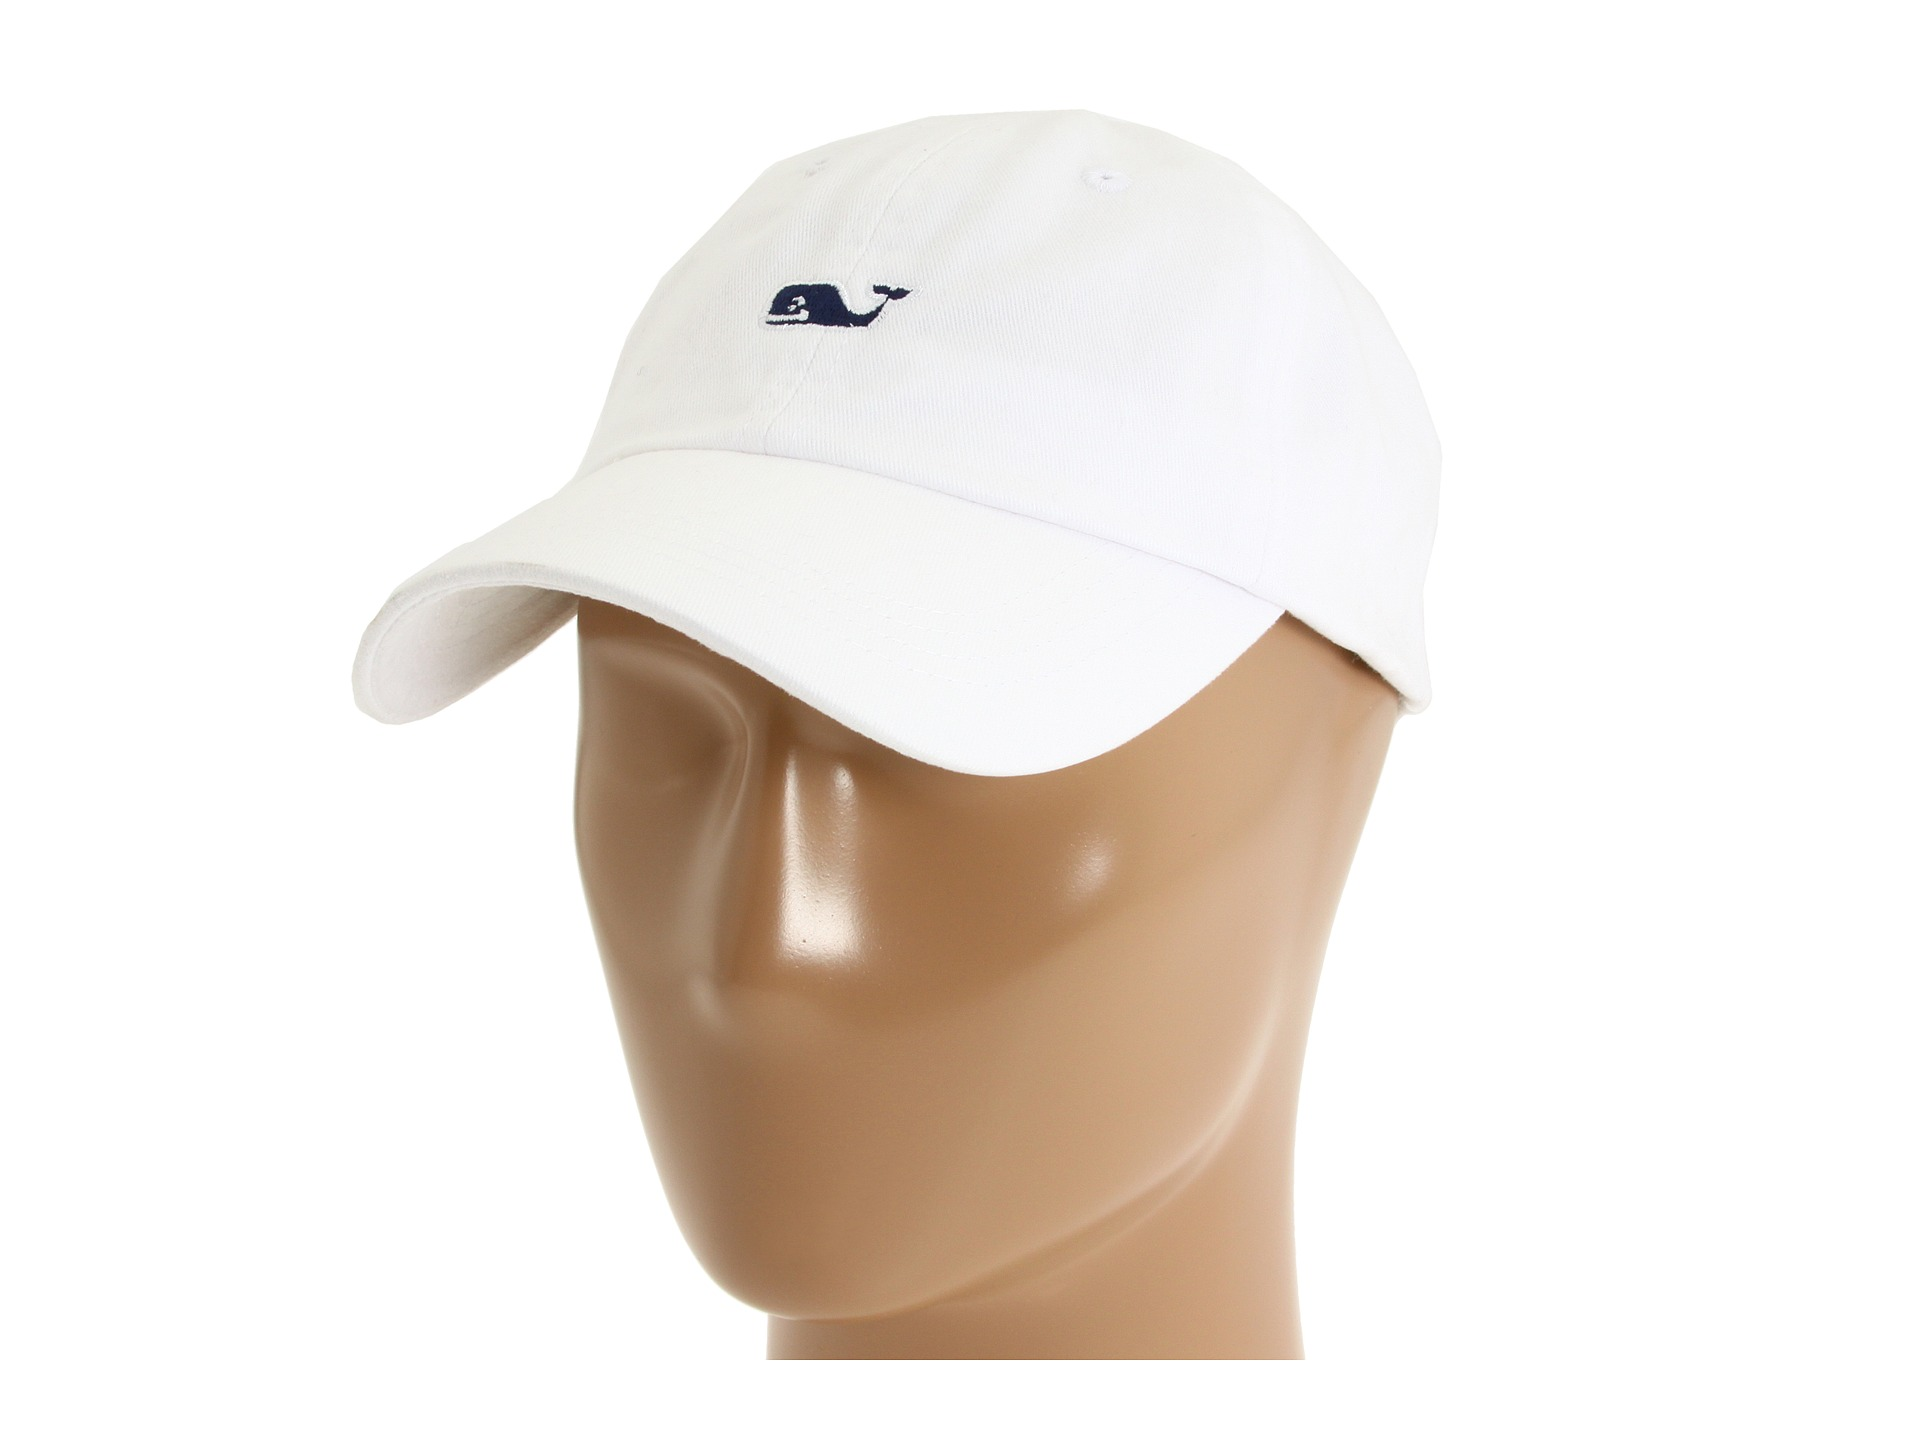 Vineyard Vines Whale Logo Baseball Hat White Cap Shipped